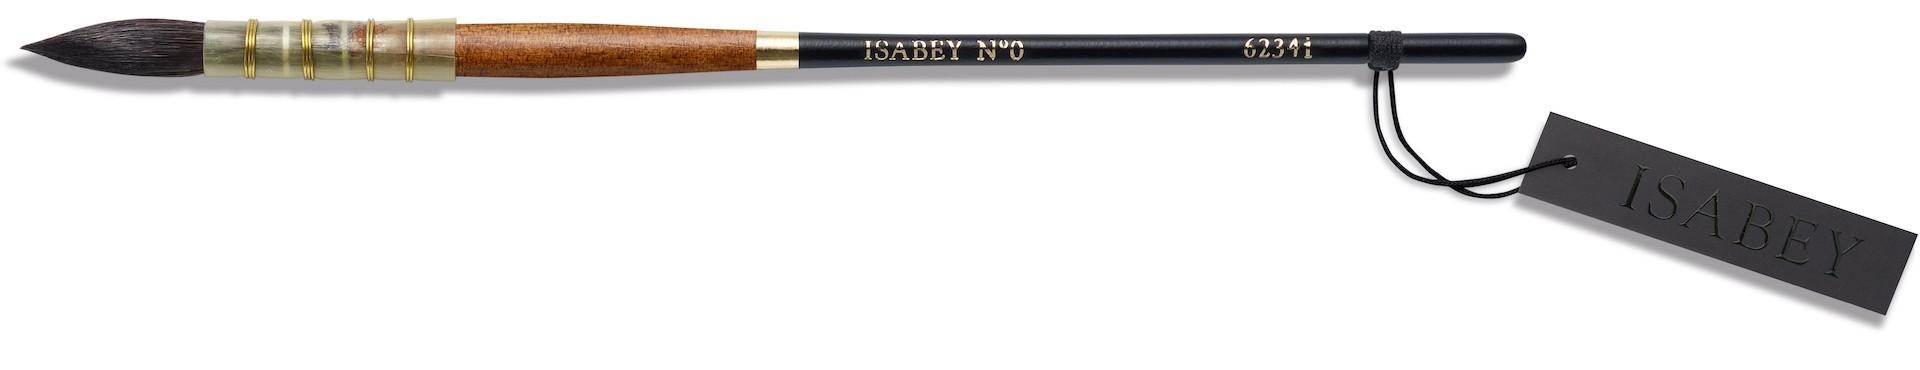 Pinceles para acuarela Isabey